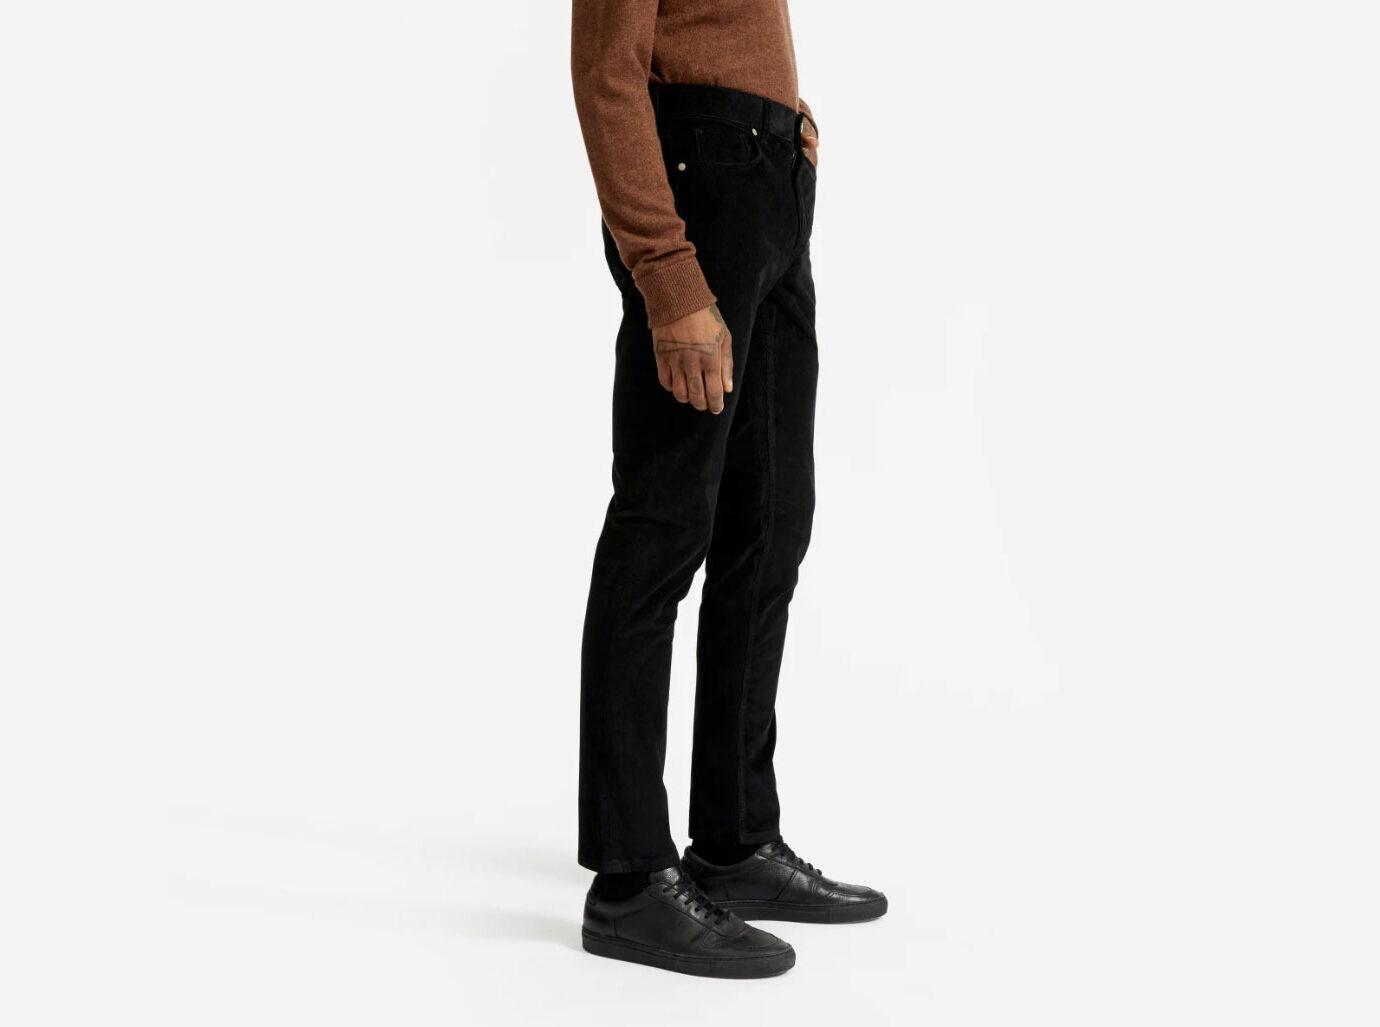 The Corduroy 5-Pocket Slim Pant — $68